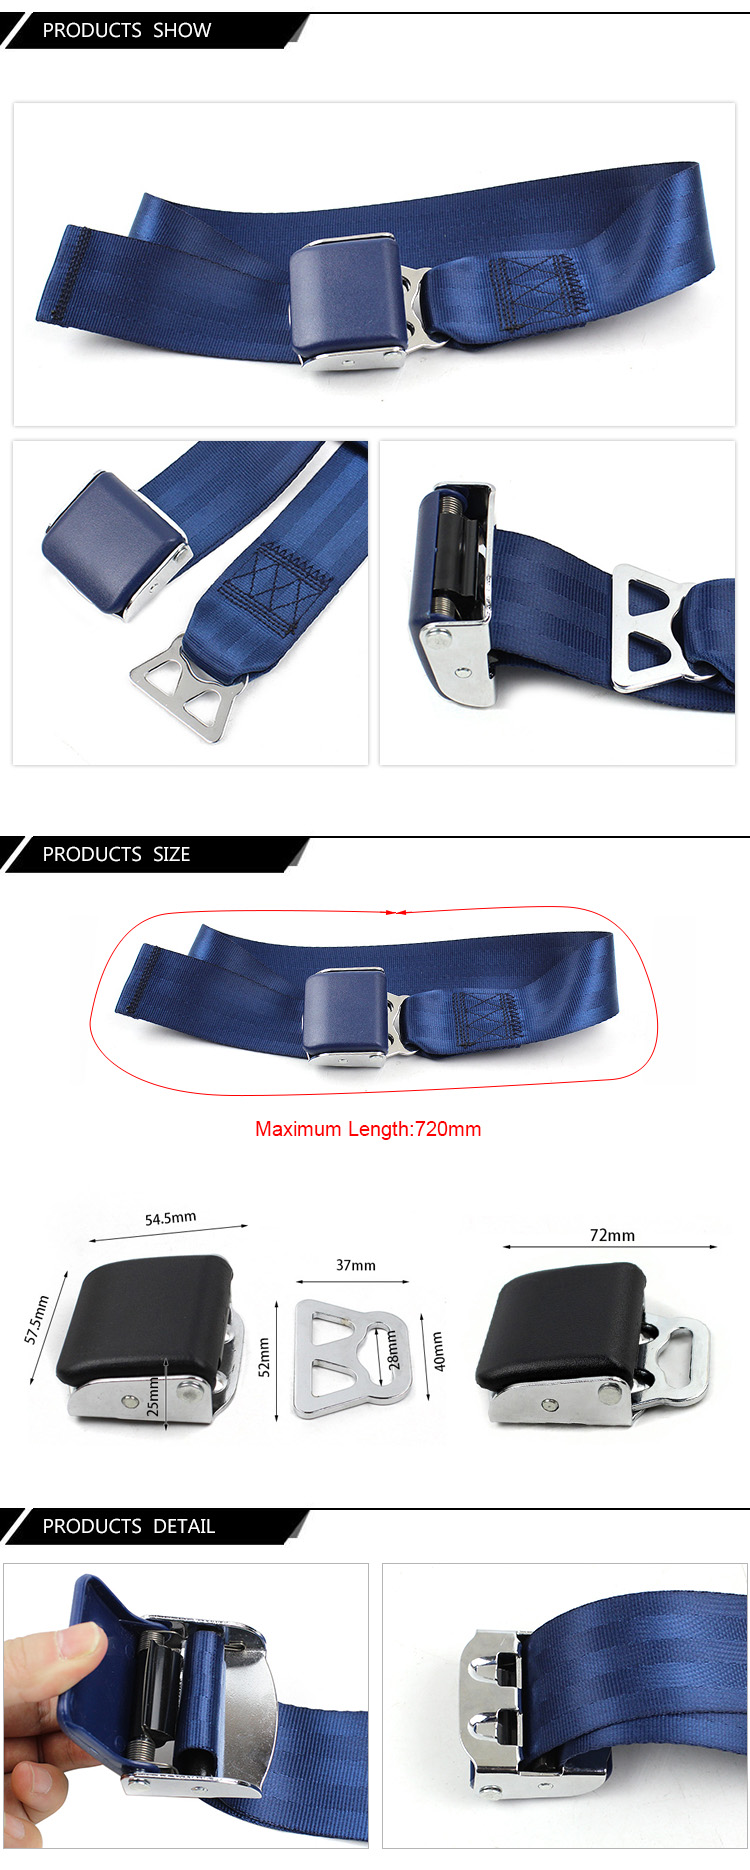 FEA047A Safety Belt Extender Blue Color